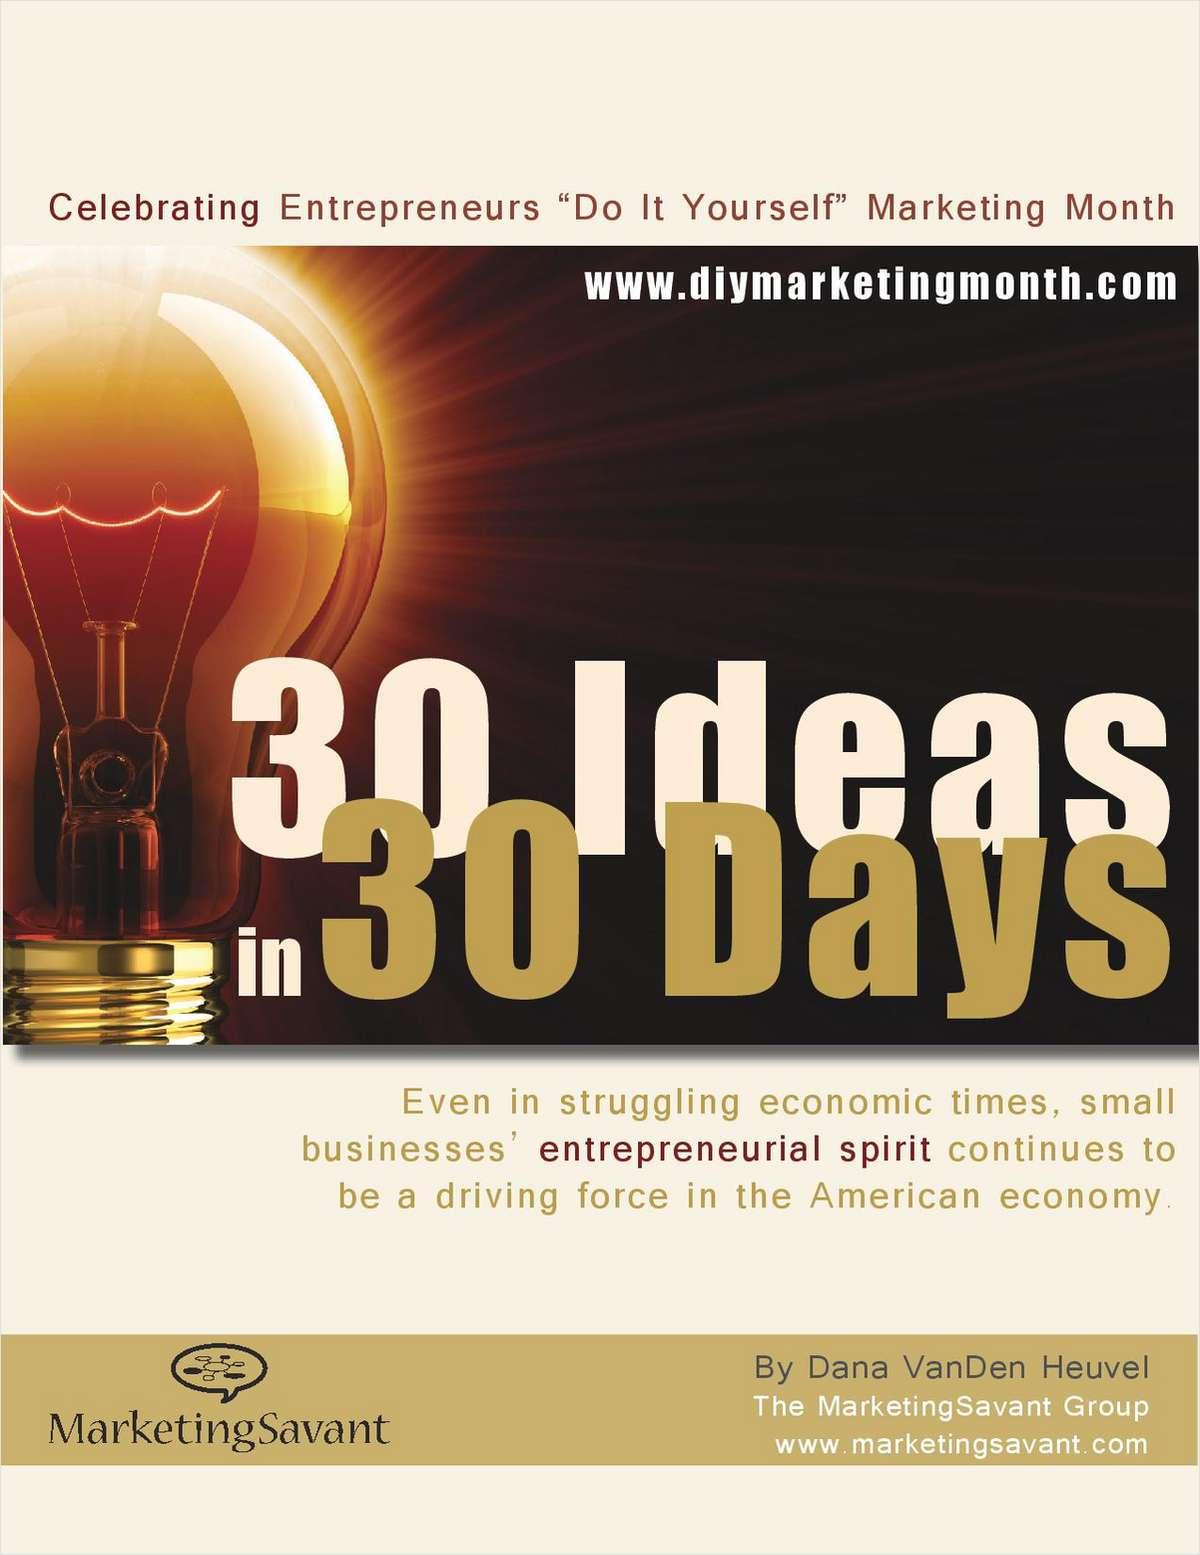 30 Marketing Ideas in 30 Days – Entrepreneurs DIY Marketing Guide